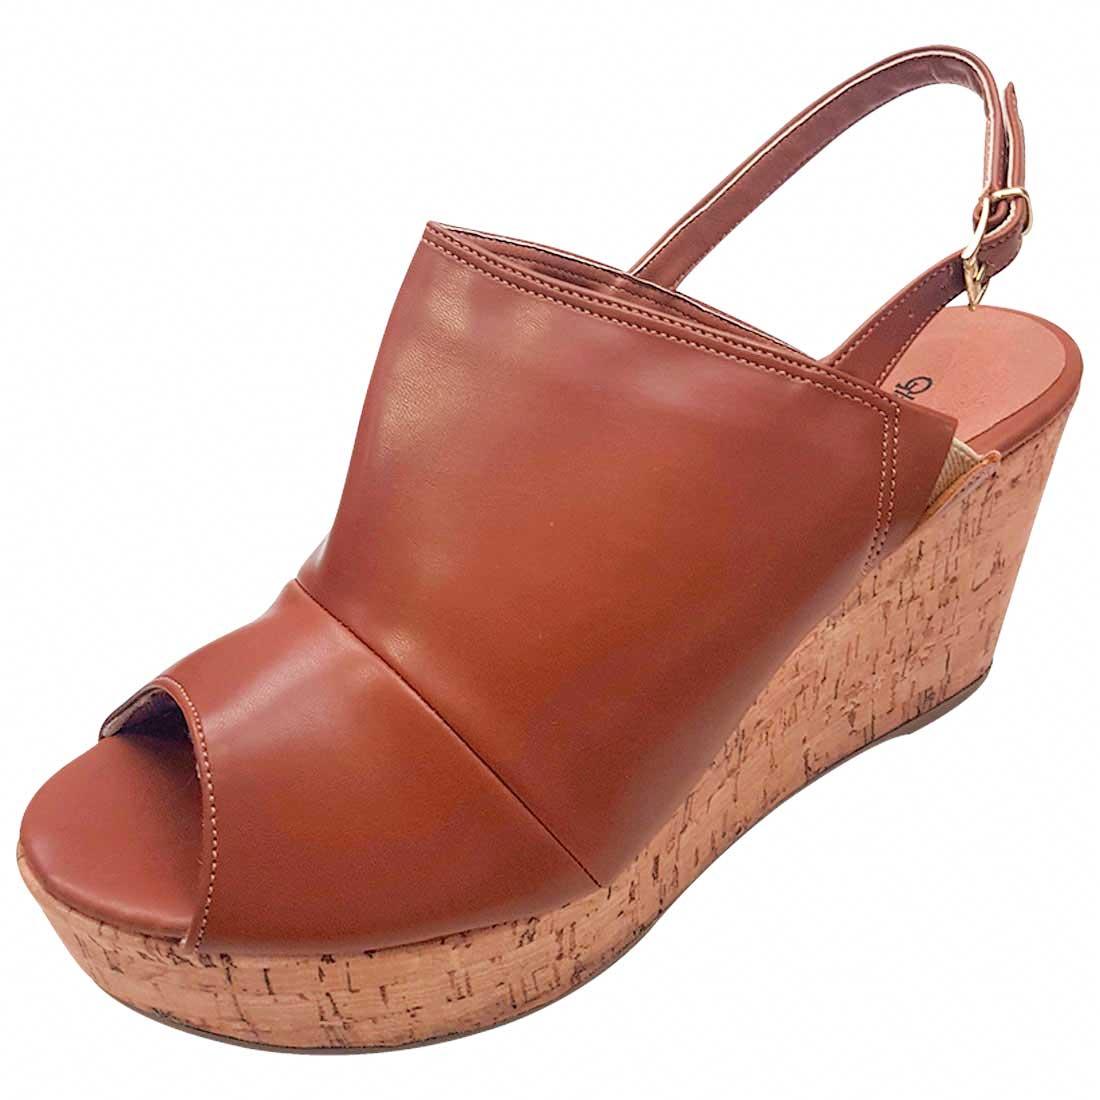 Sandal Boot Anabela de Salto Cortiça - Caramelo